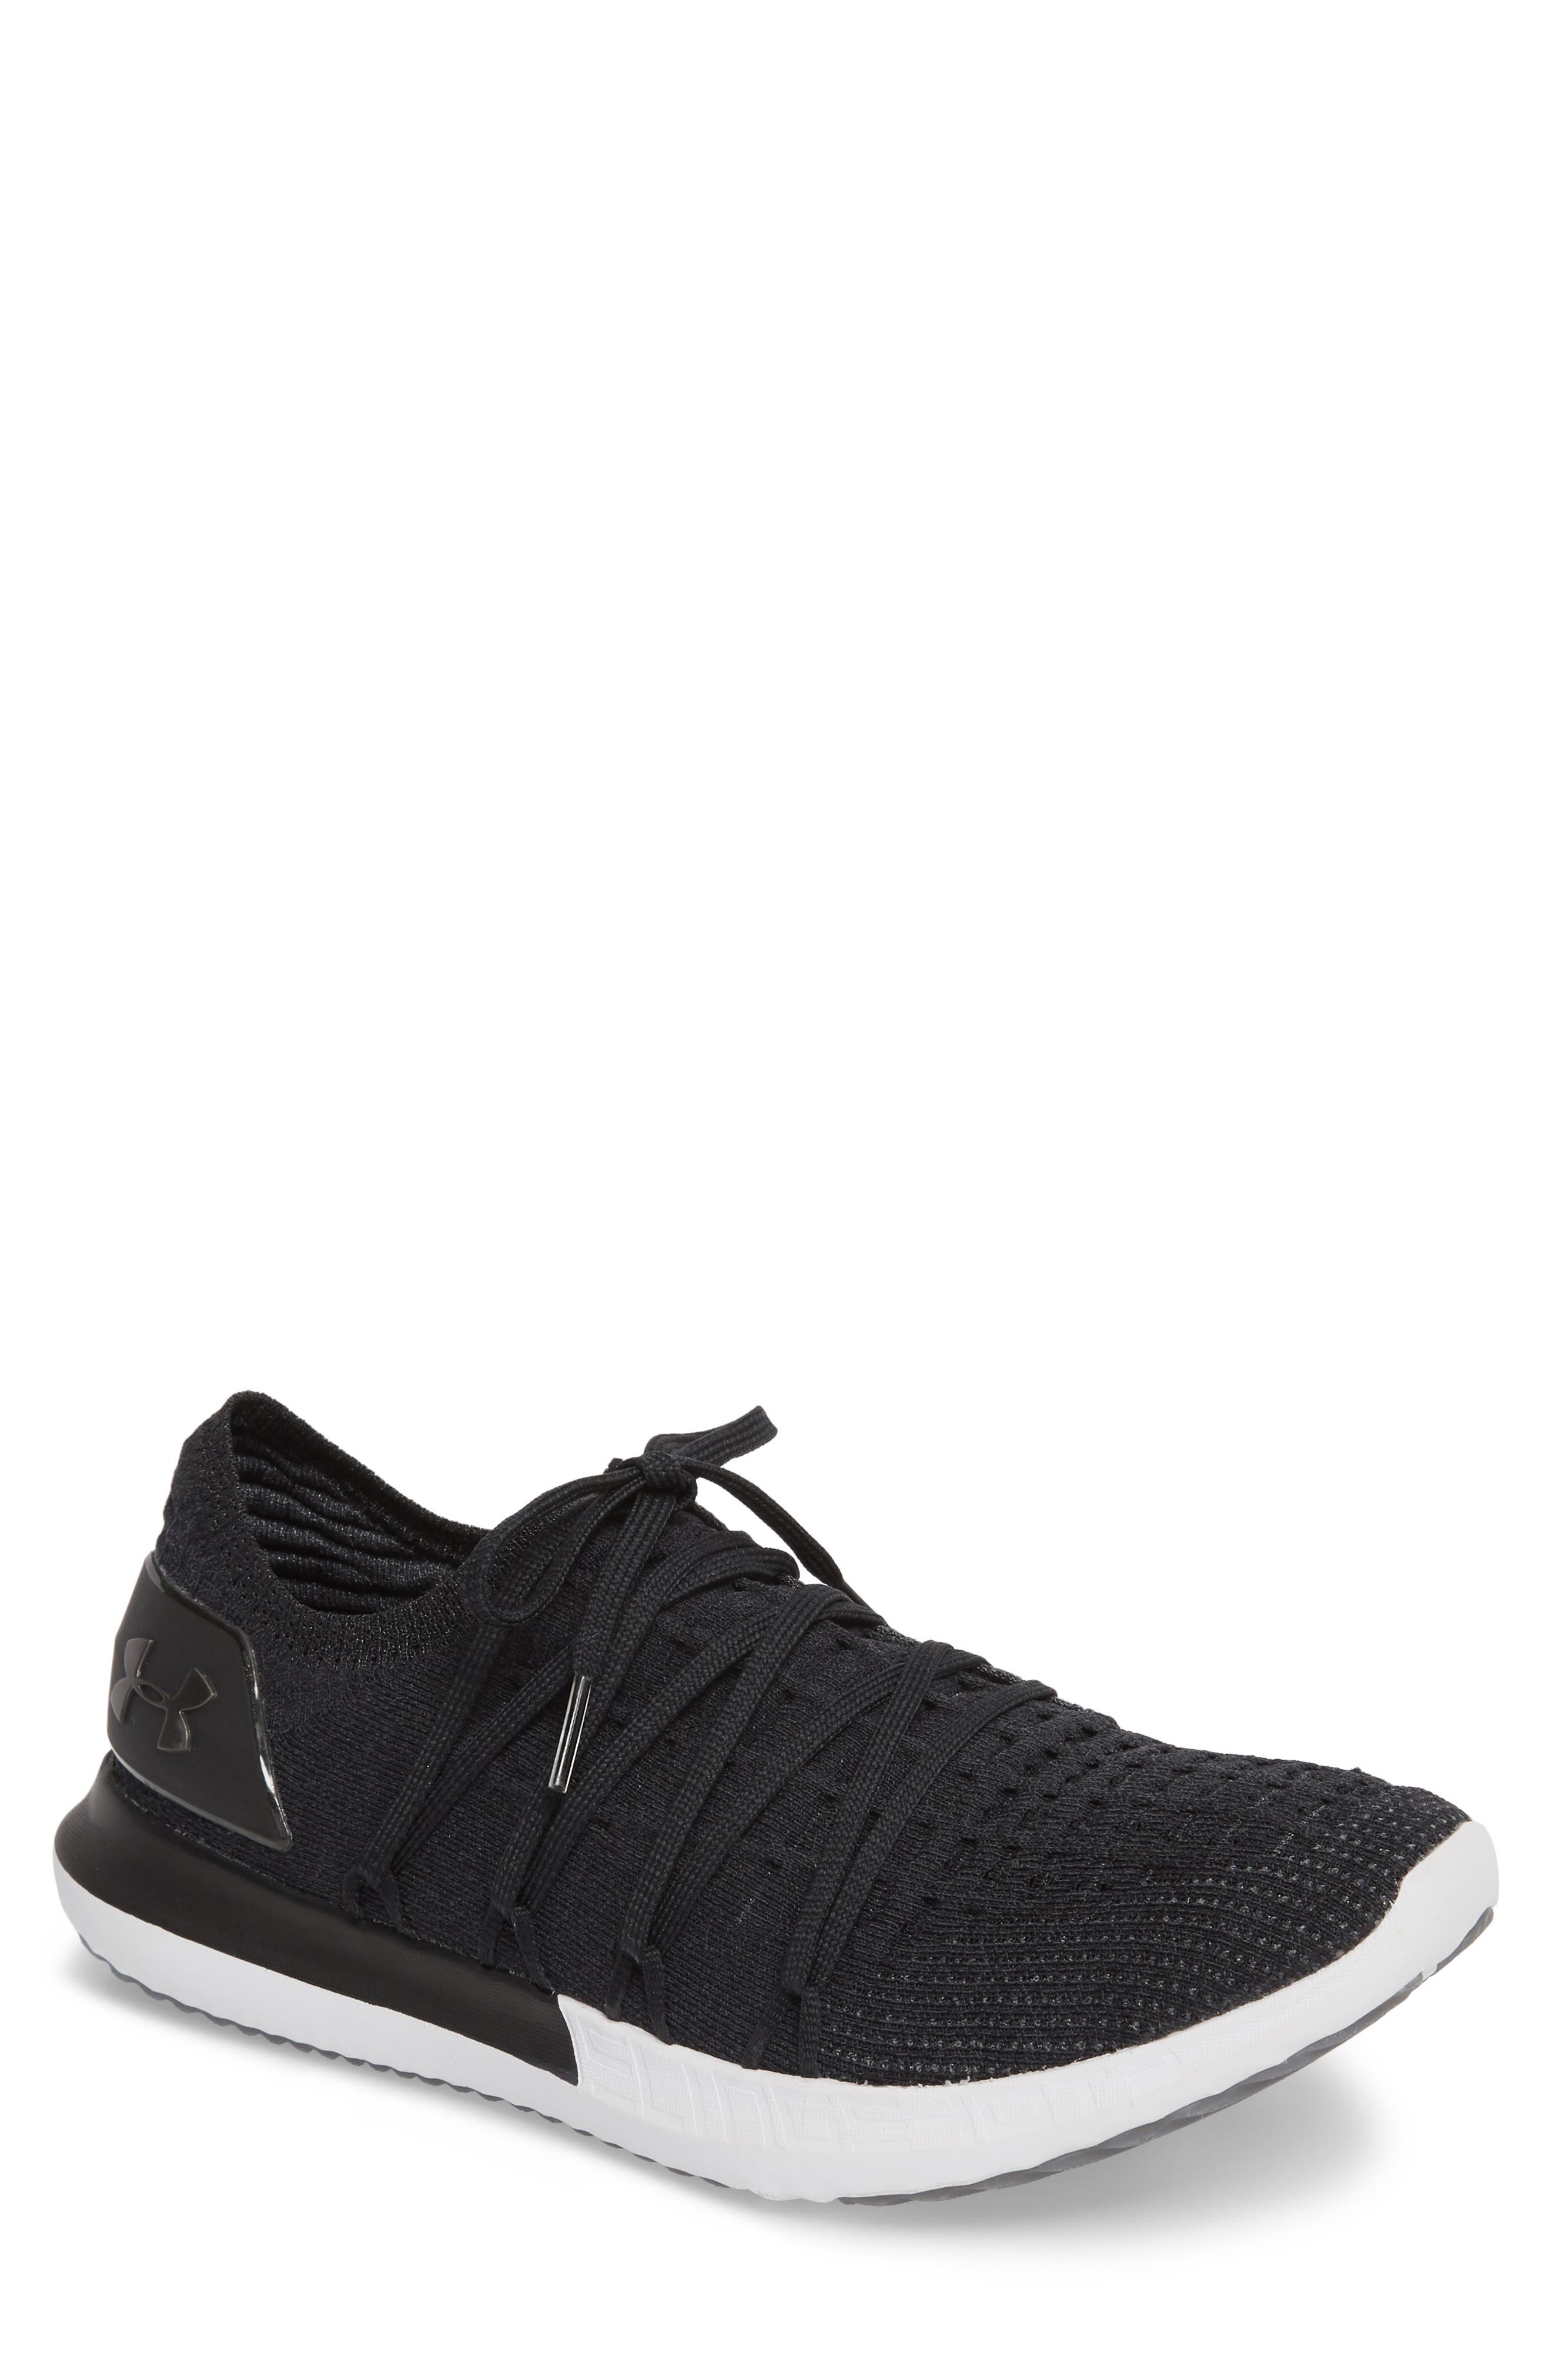 Speedform<sup>®</sup> Slingshot 2 Sneaker,                         Main,                         color, BLACK / ANTHRACITE / METALLIC